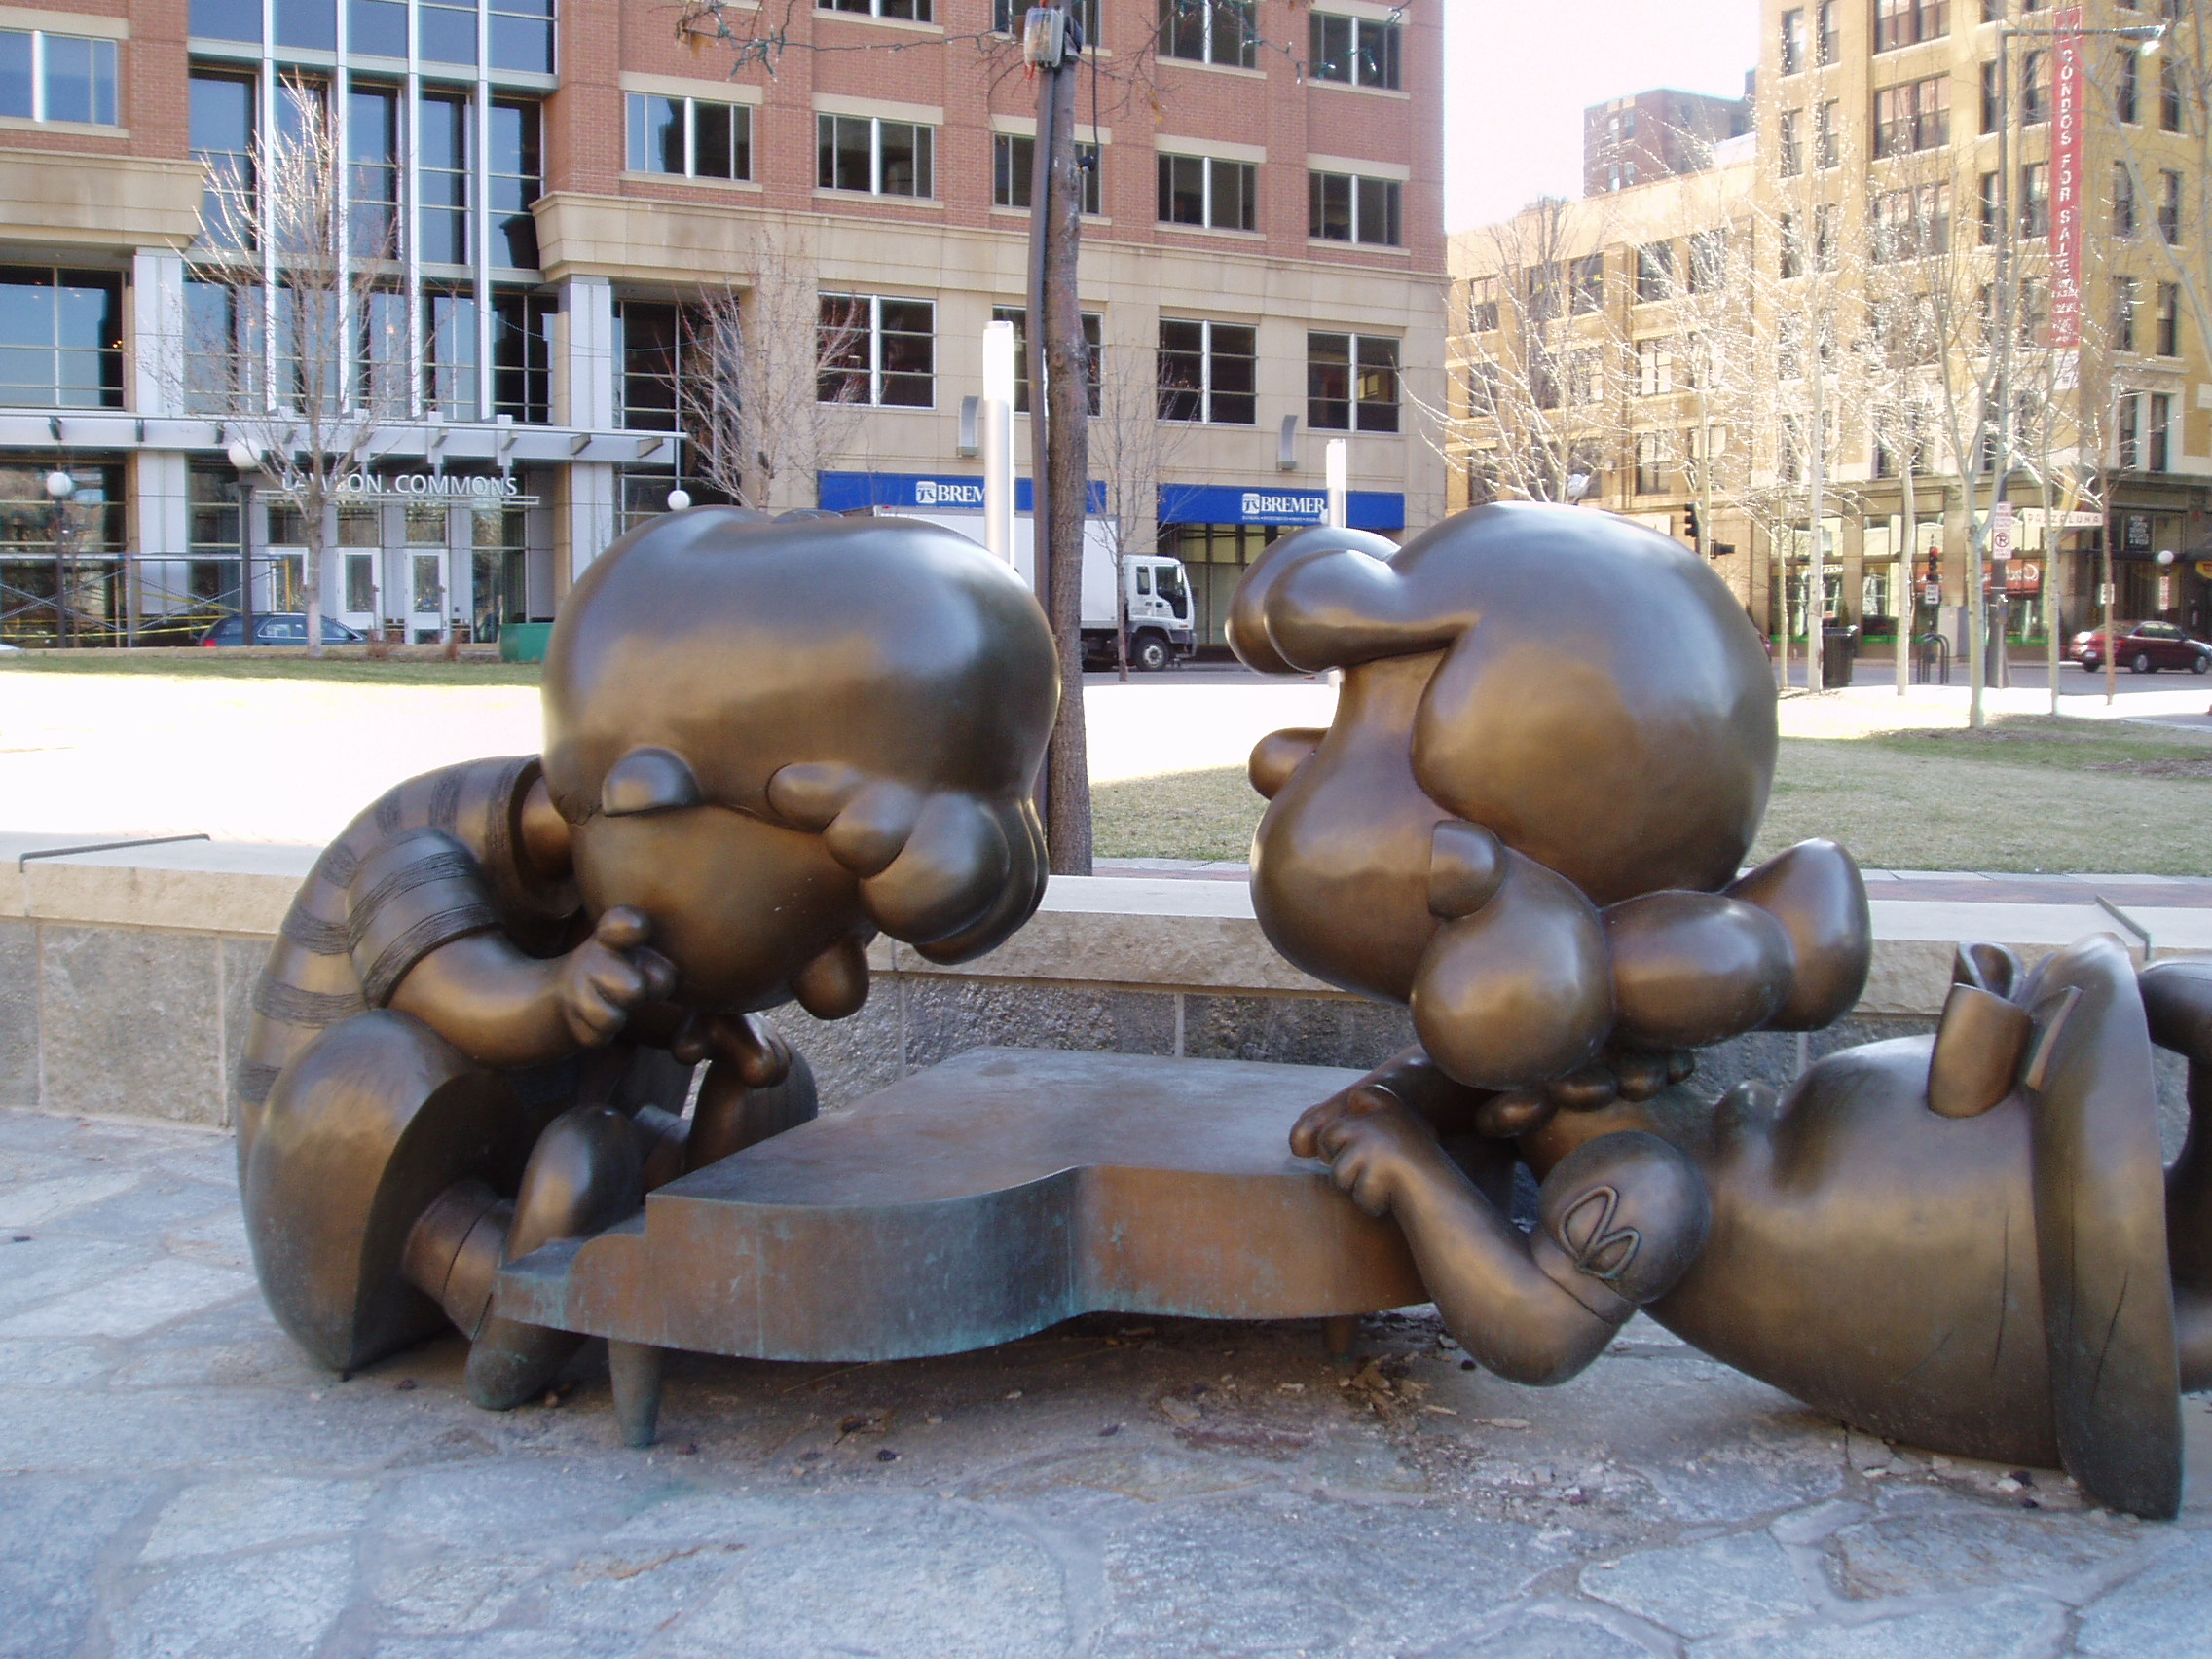 Landmark Plaza - Snoopy Park